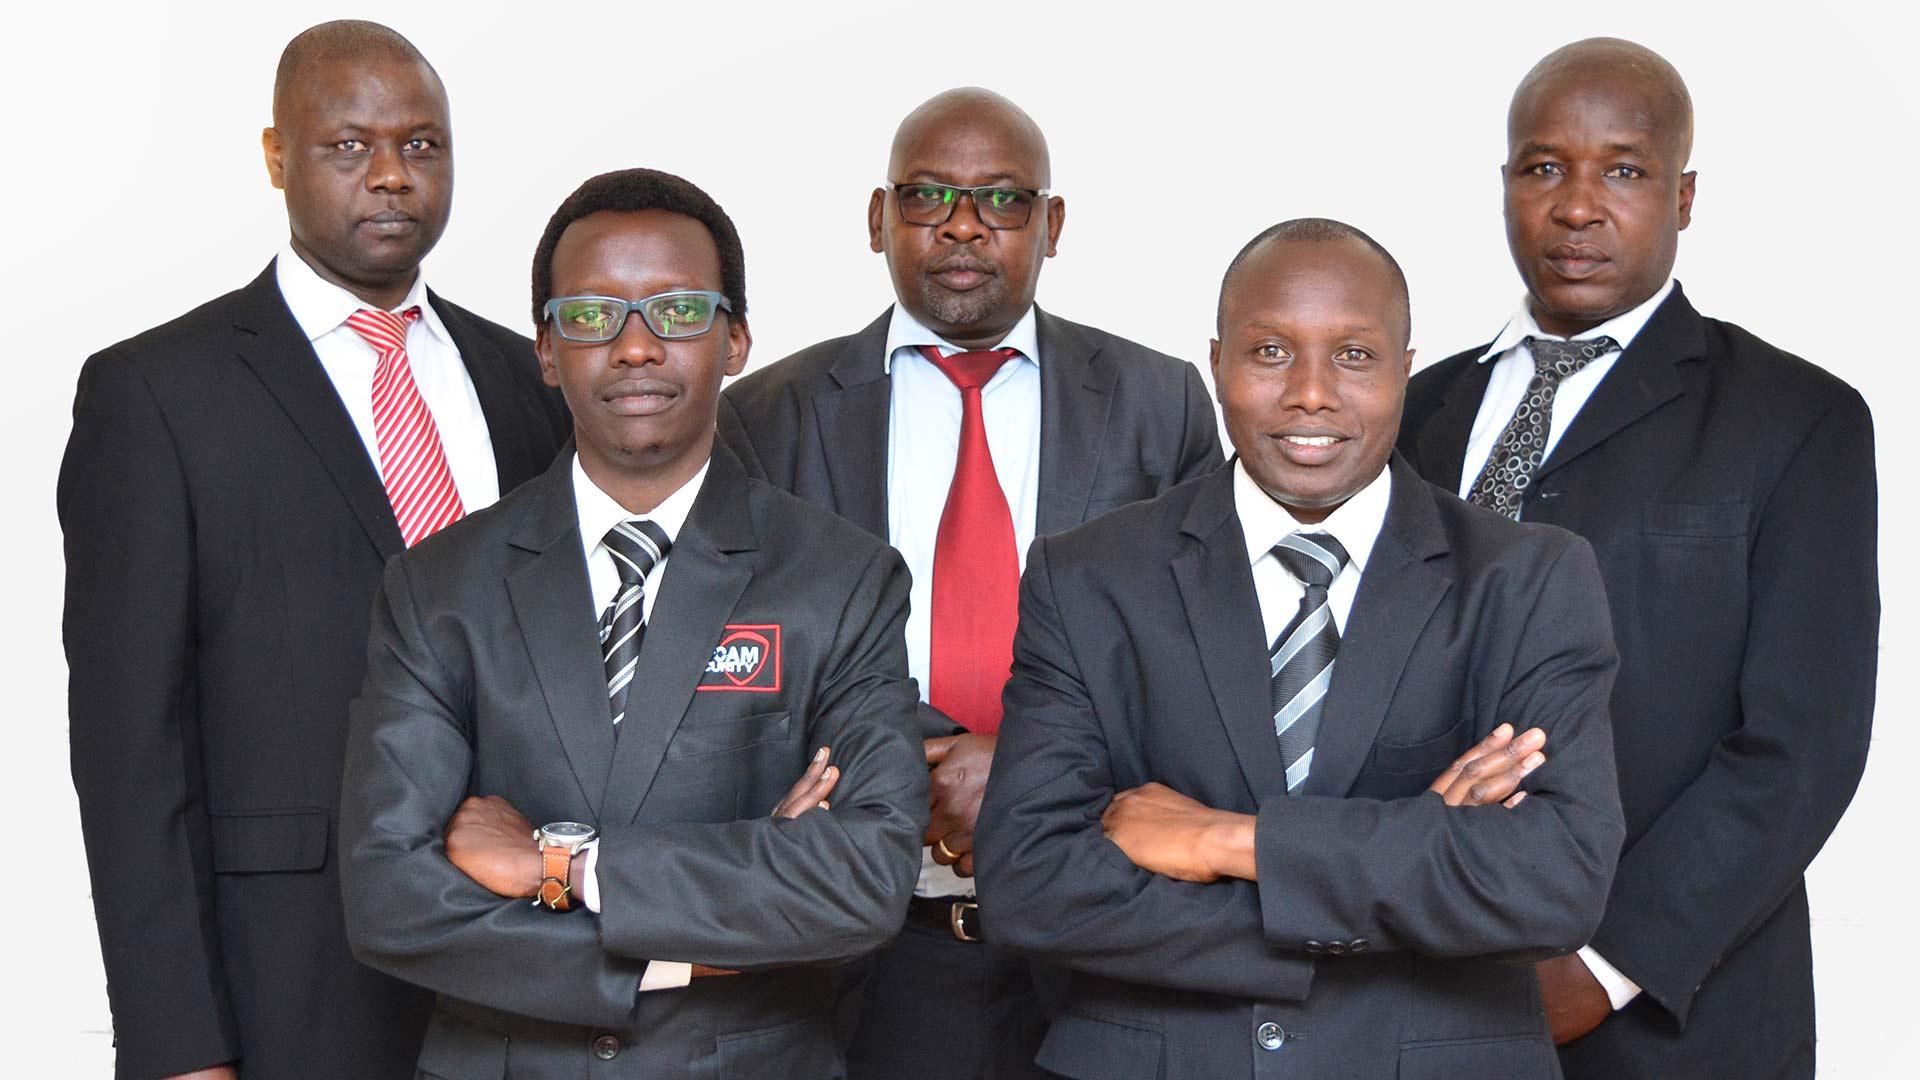 mocam-security-company-in-kenya-team-2